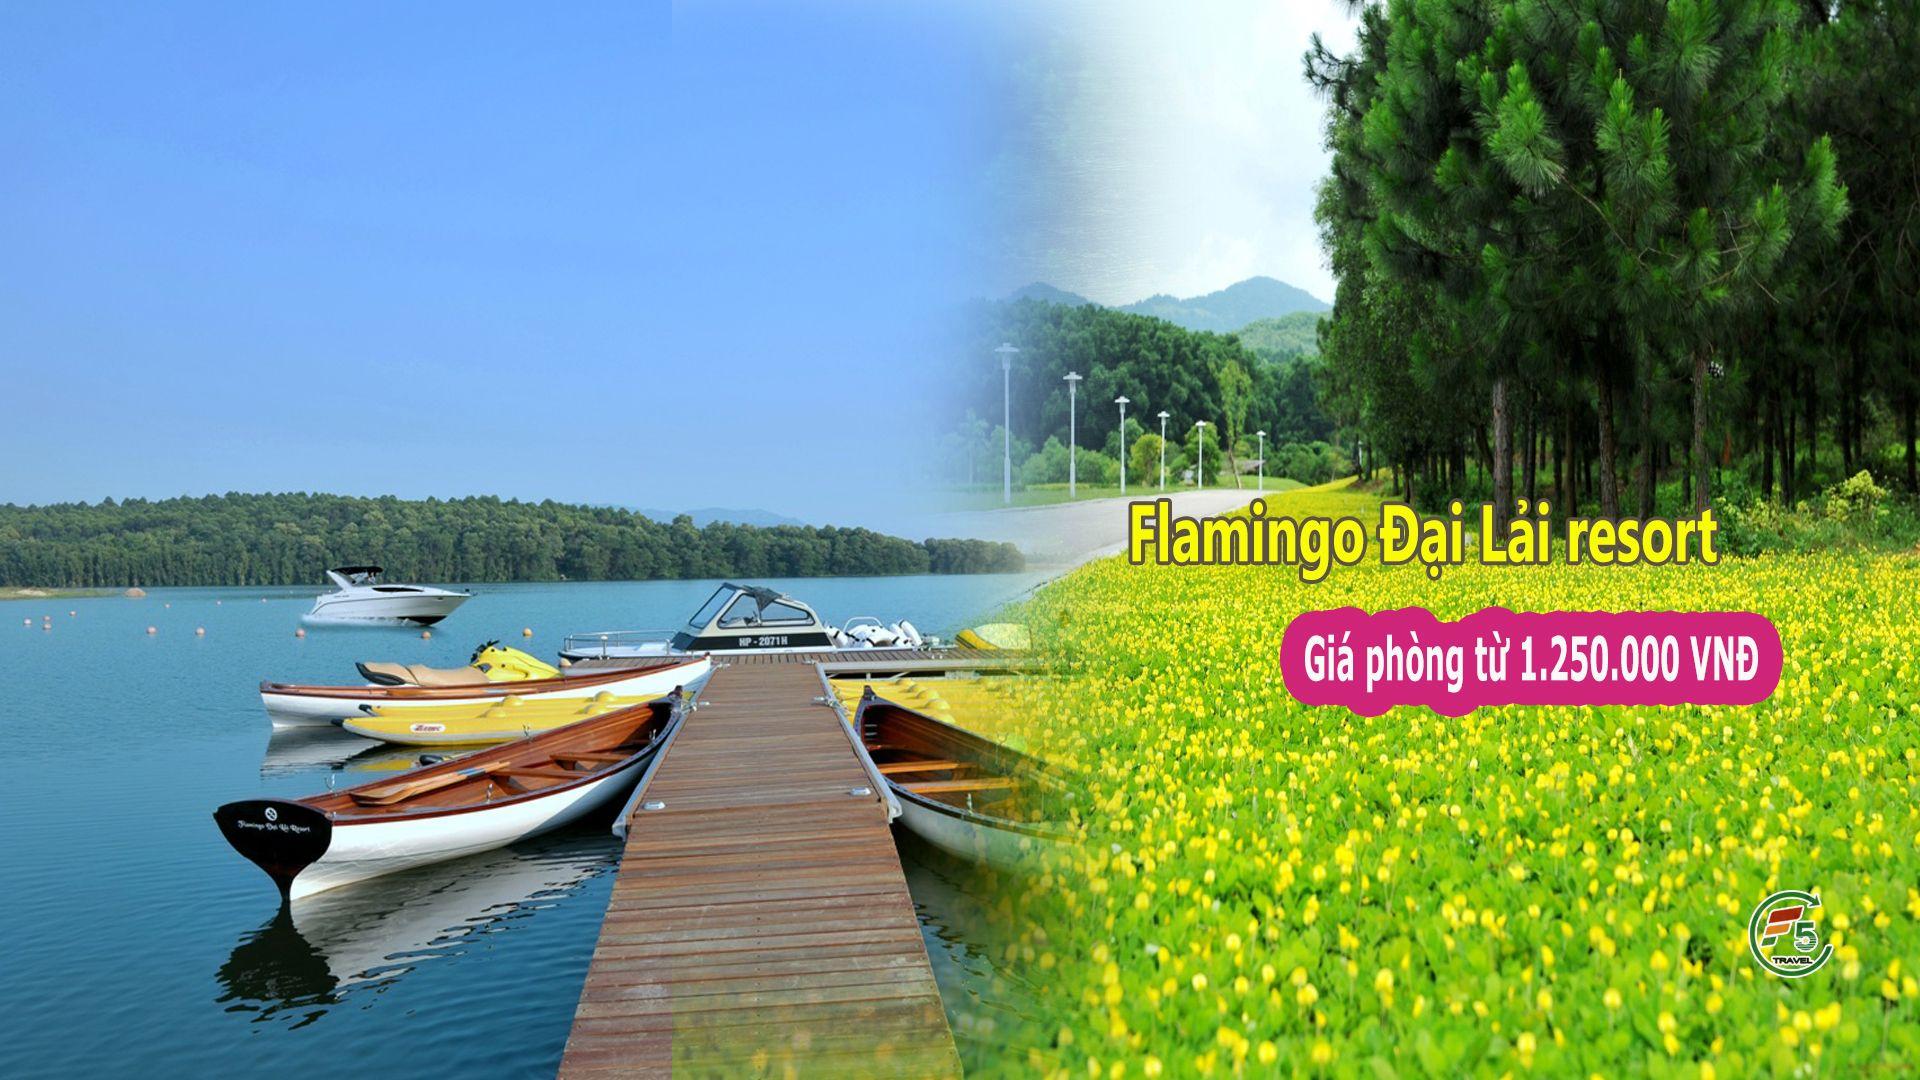 Vietnam Hanoi Flamingo 1920x1080 - TRANG CHỦ